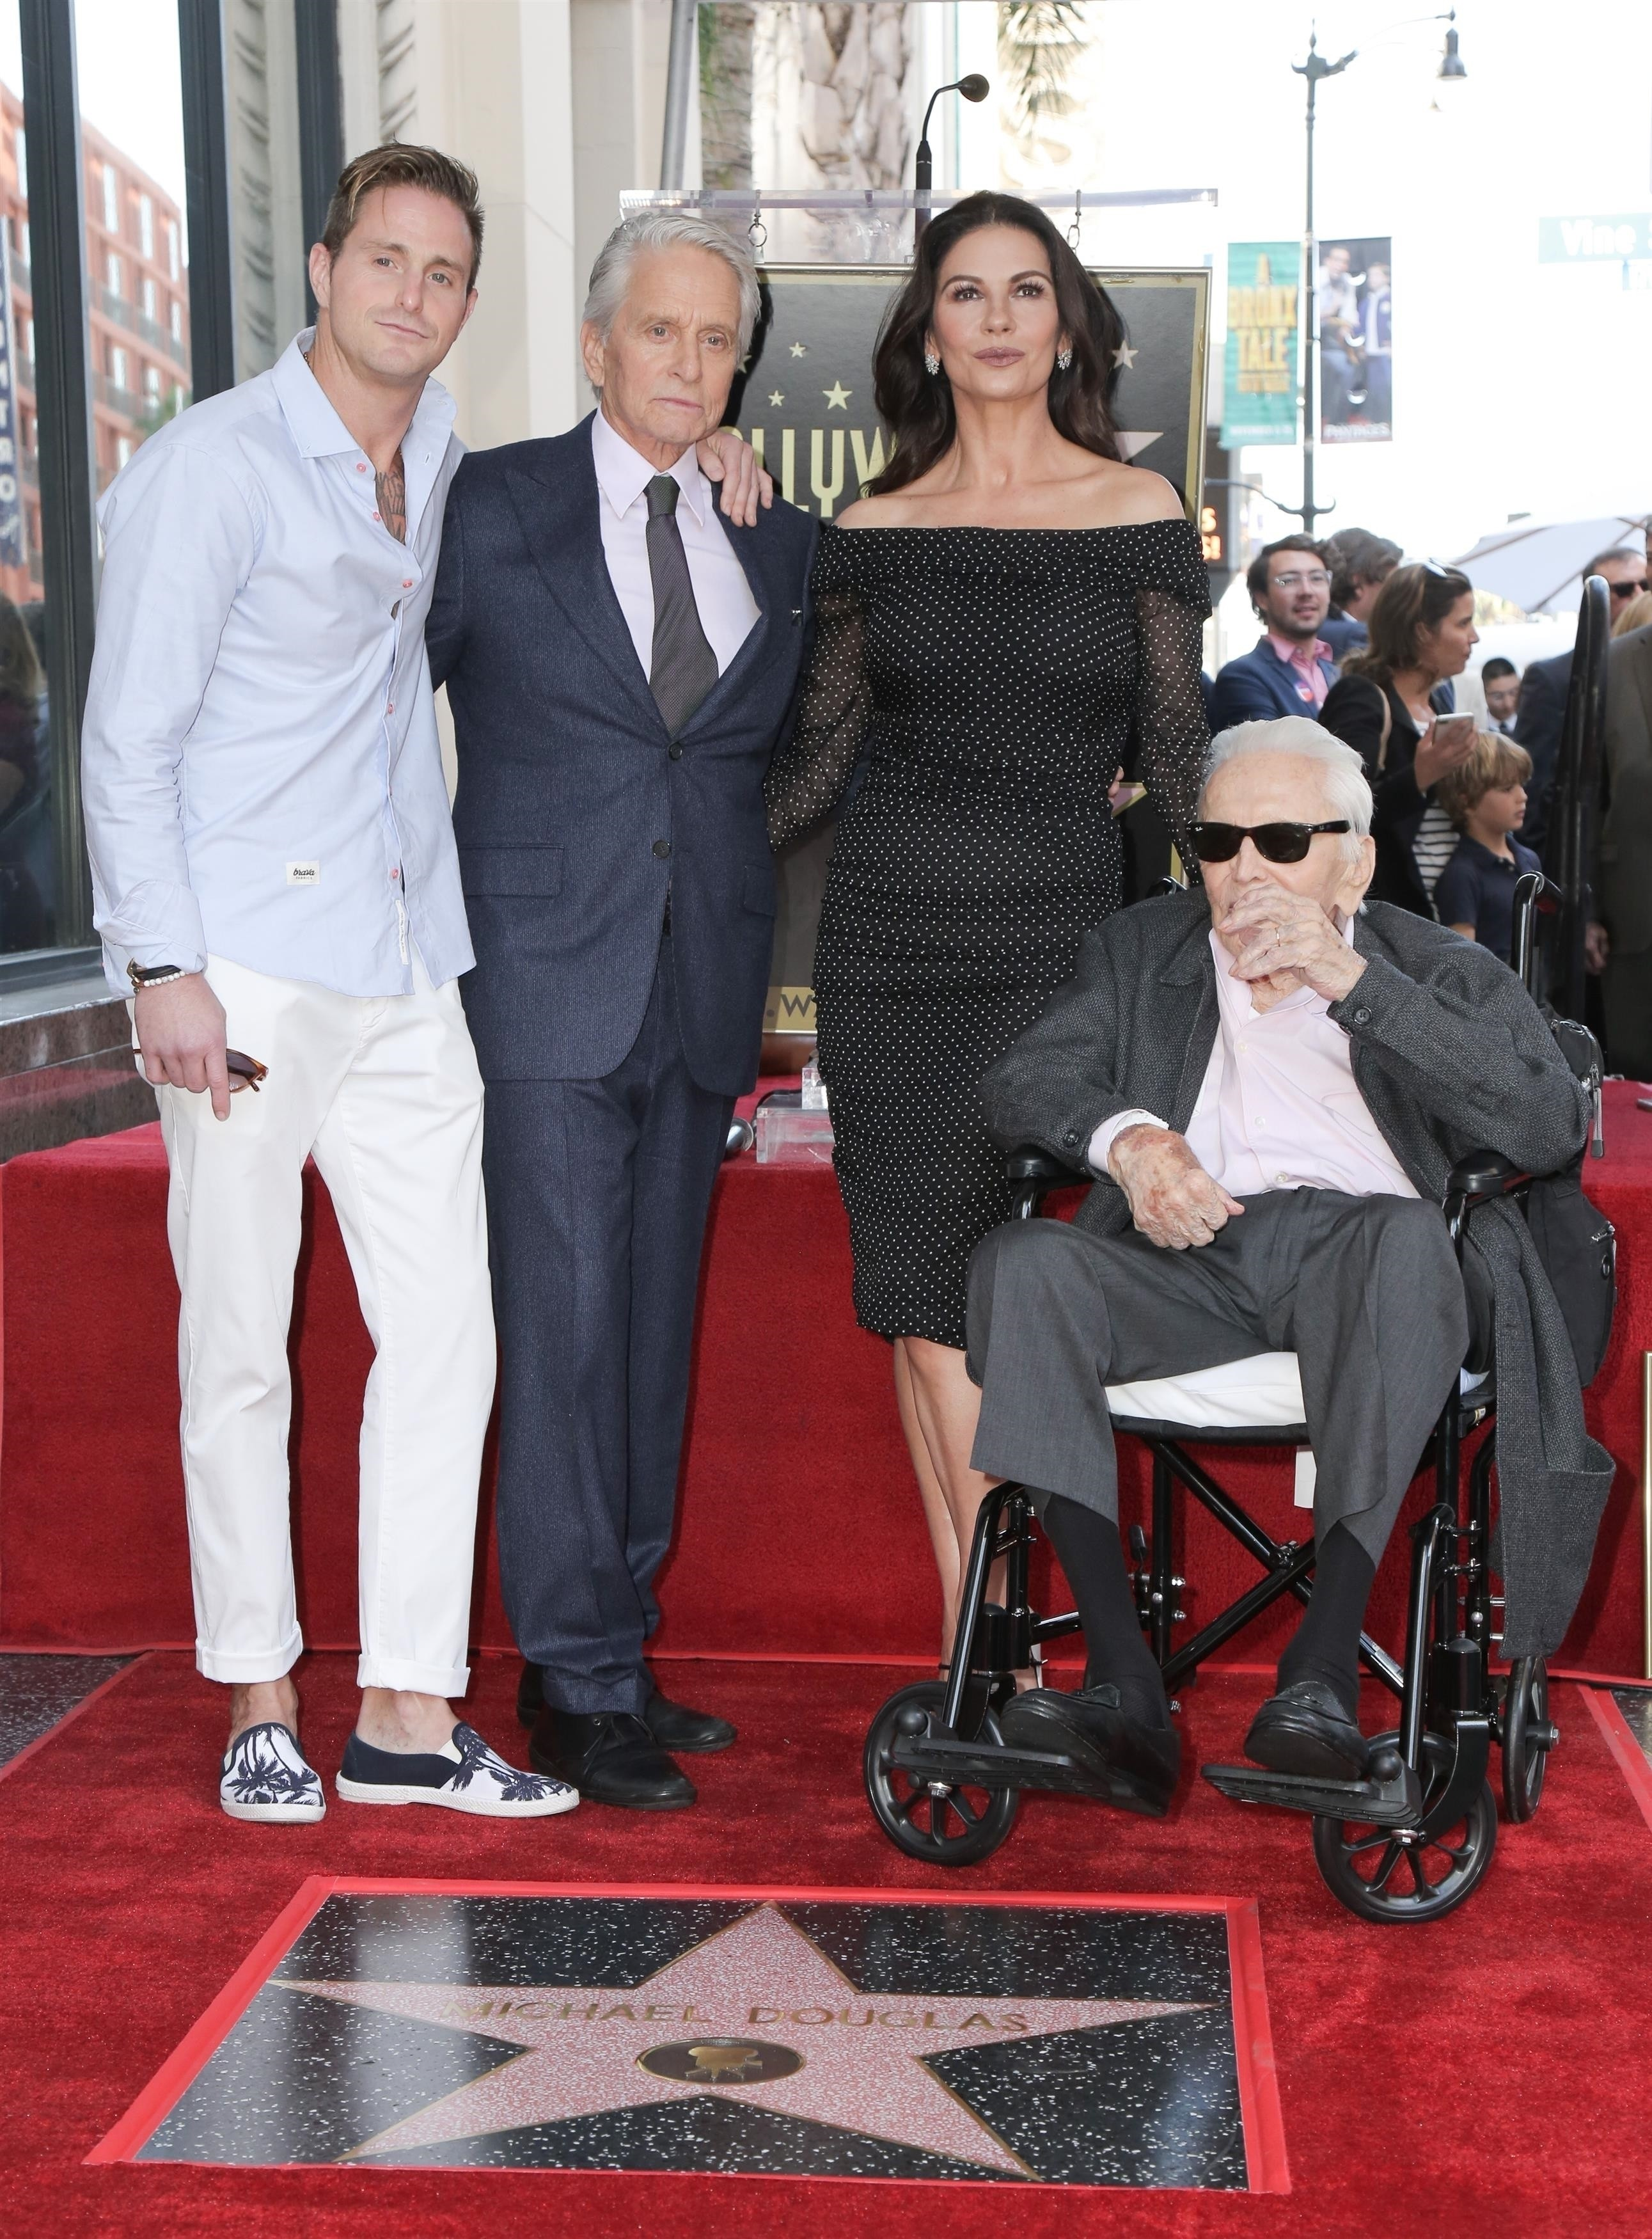 Cameron e Michael Douglas, Catherine Zeta-Jones e Kirk Douglas (Foto: Backgrid)